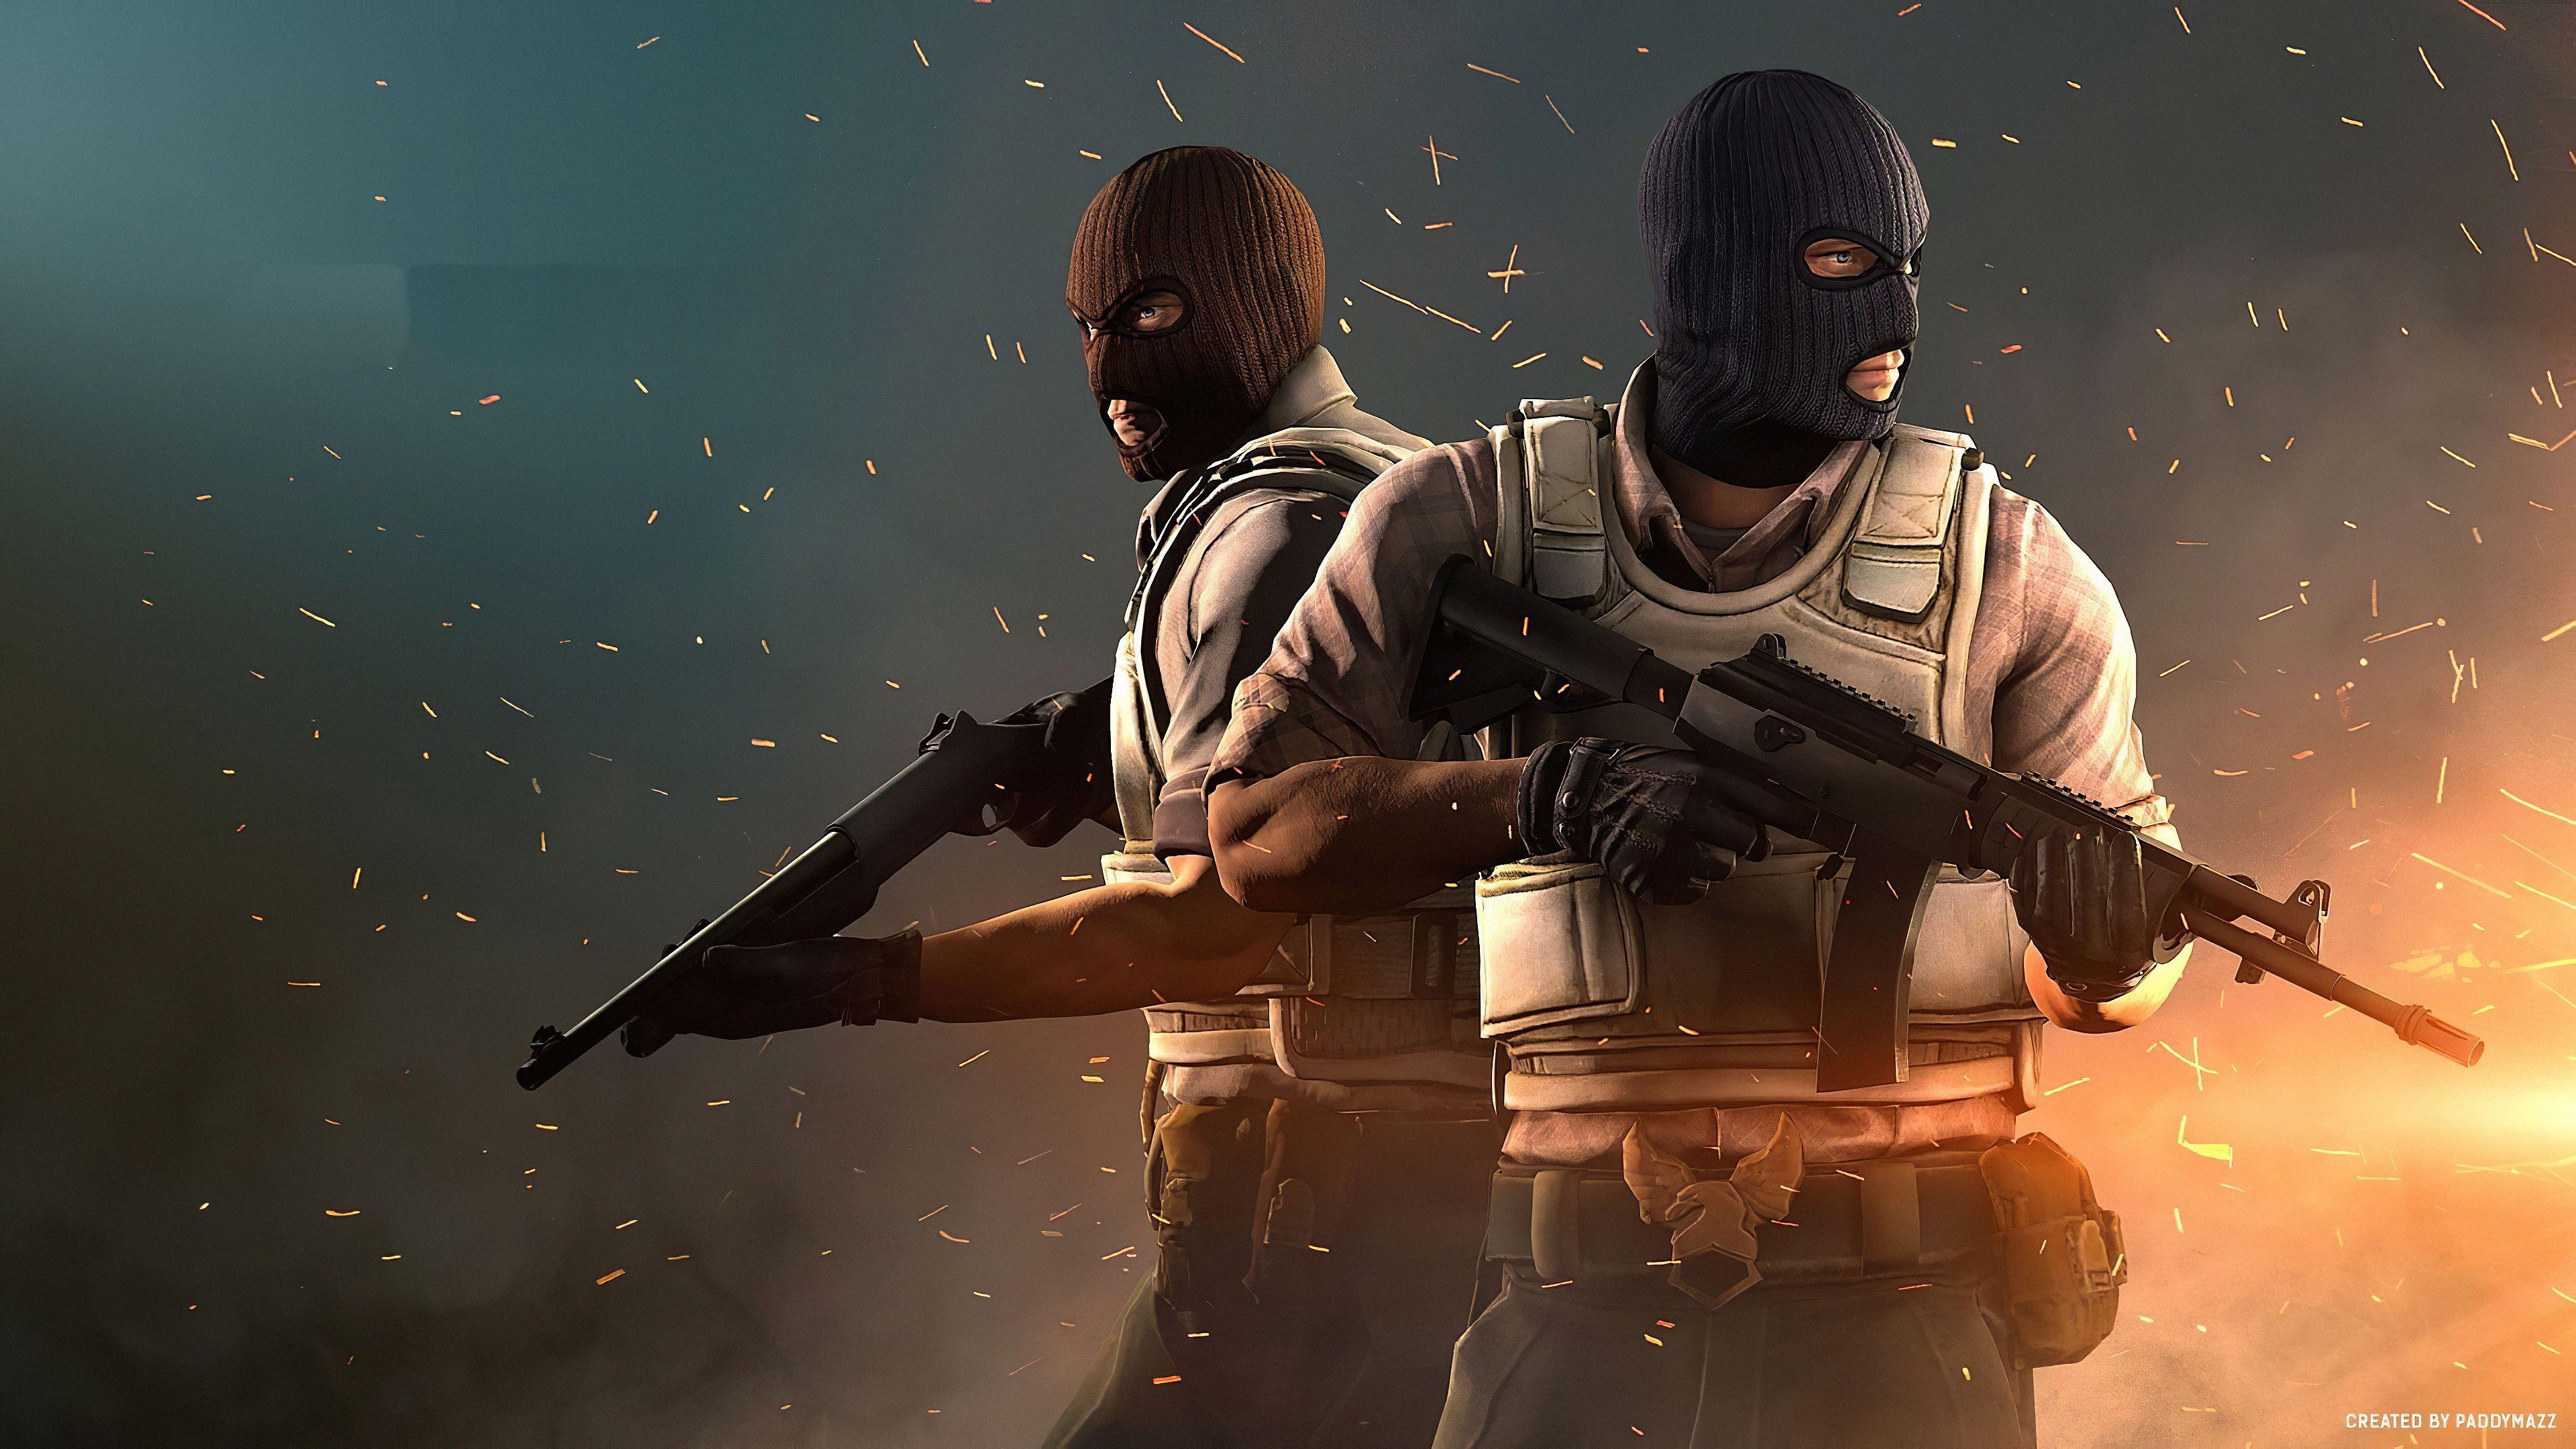 Counter Strike Global Offensive New Hd Wallpapers Games Wallpapers Counter Strike Wallpapers 4k Wallpapers In 2020 Go Wallpaper Best Games Fear No Man